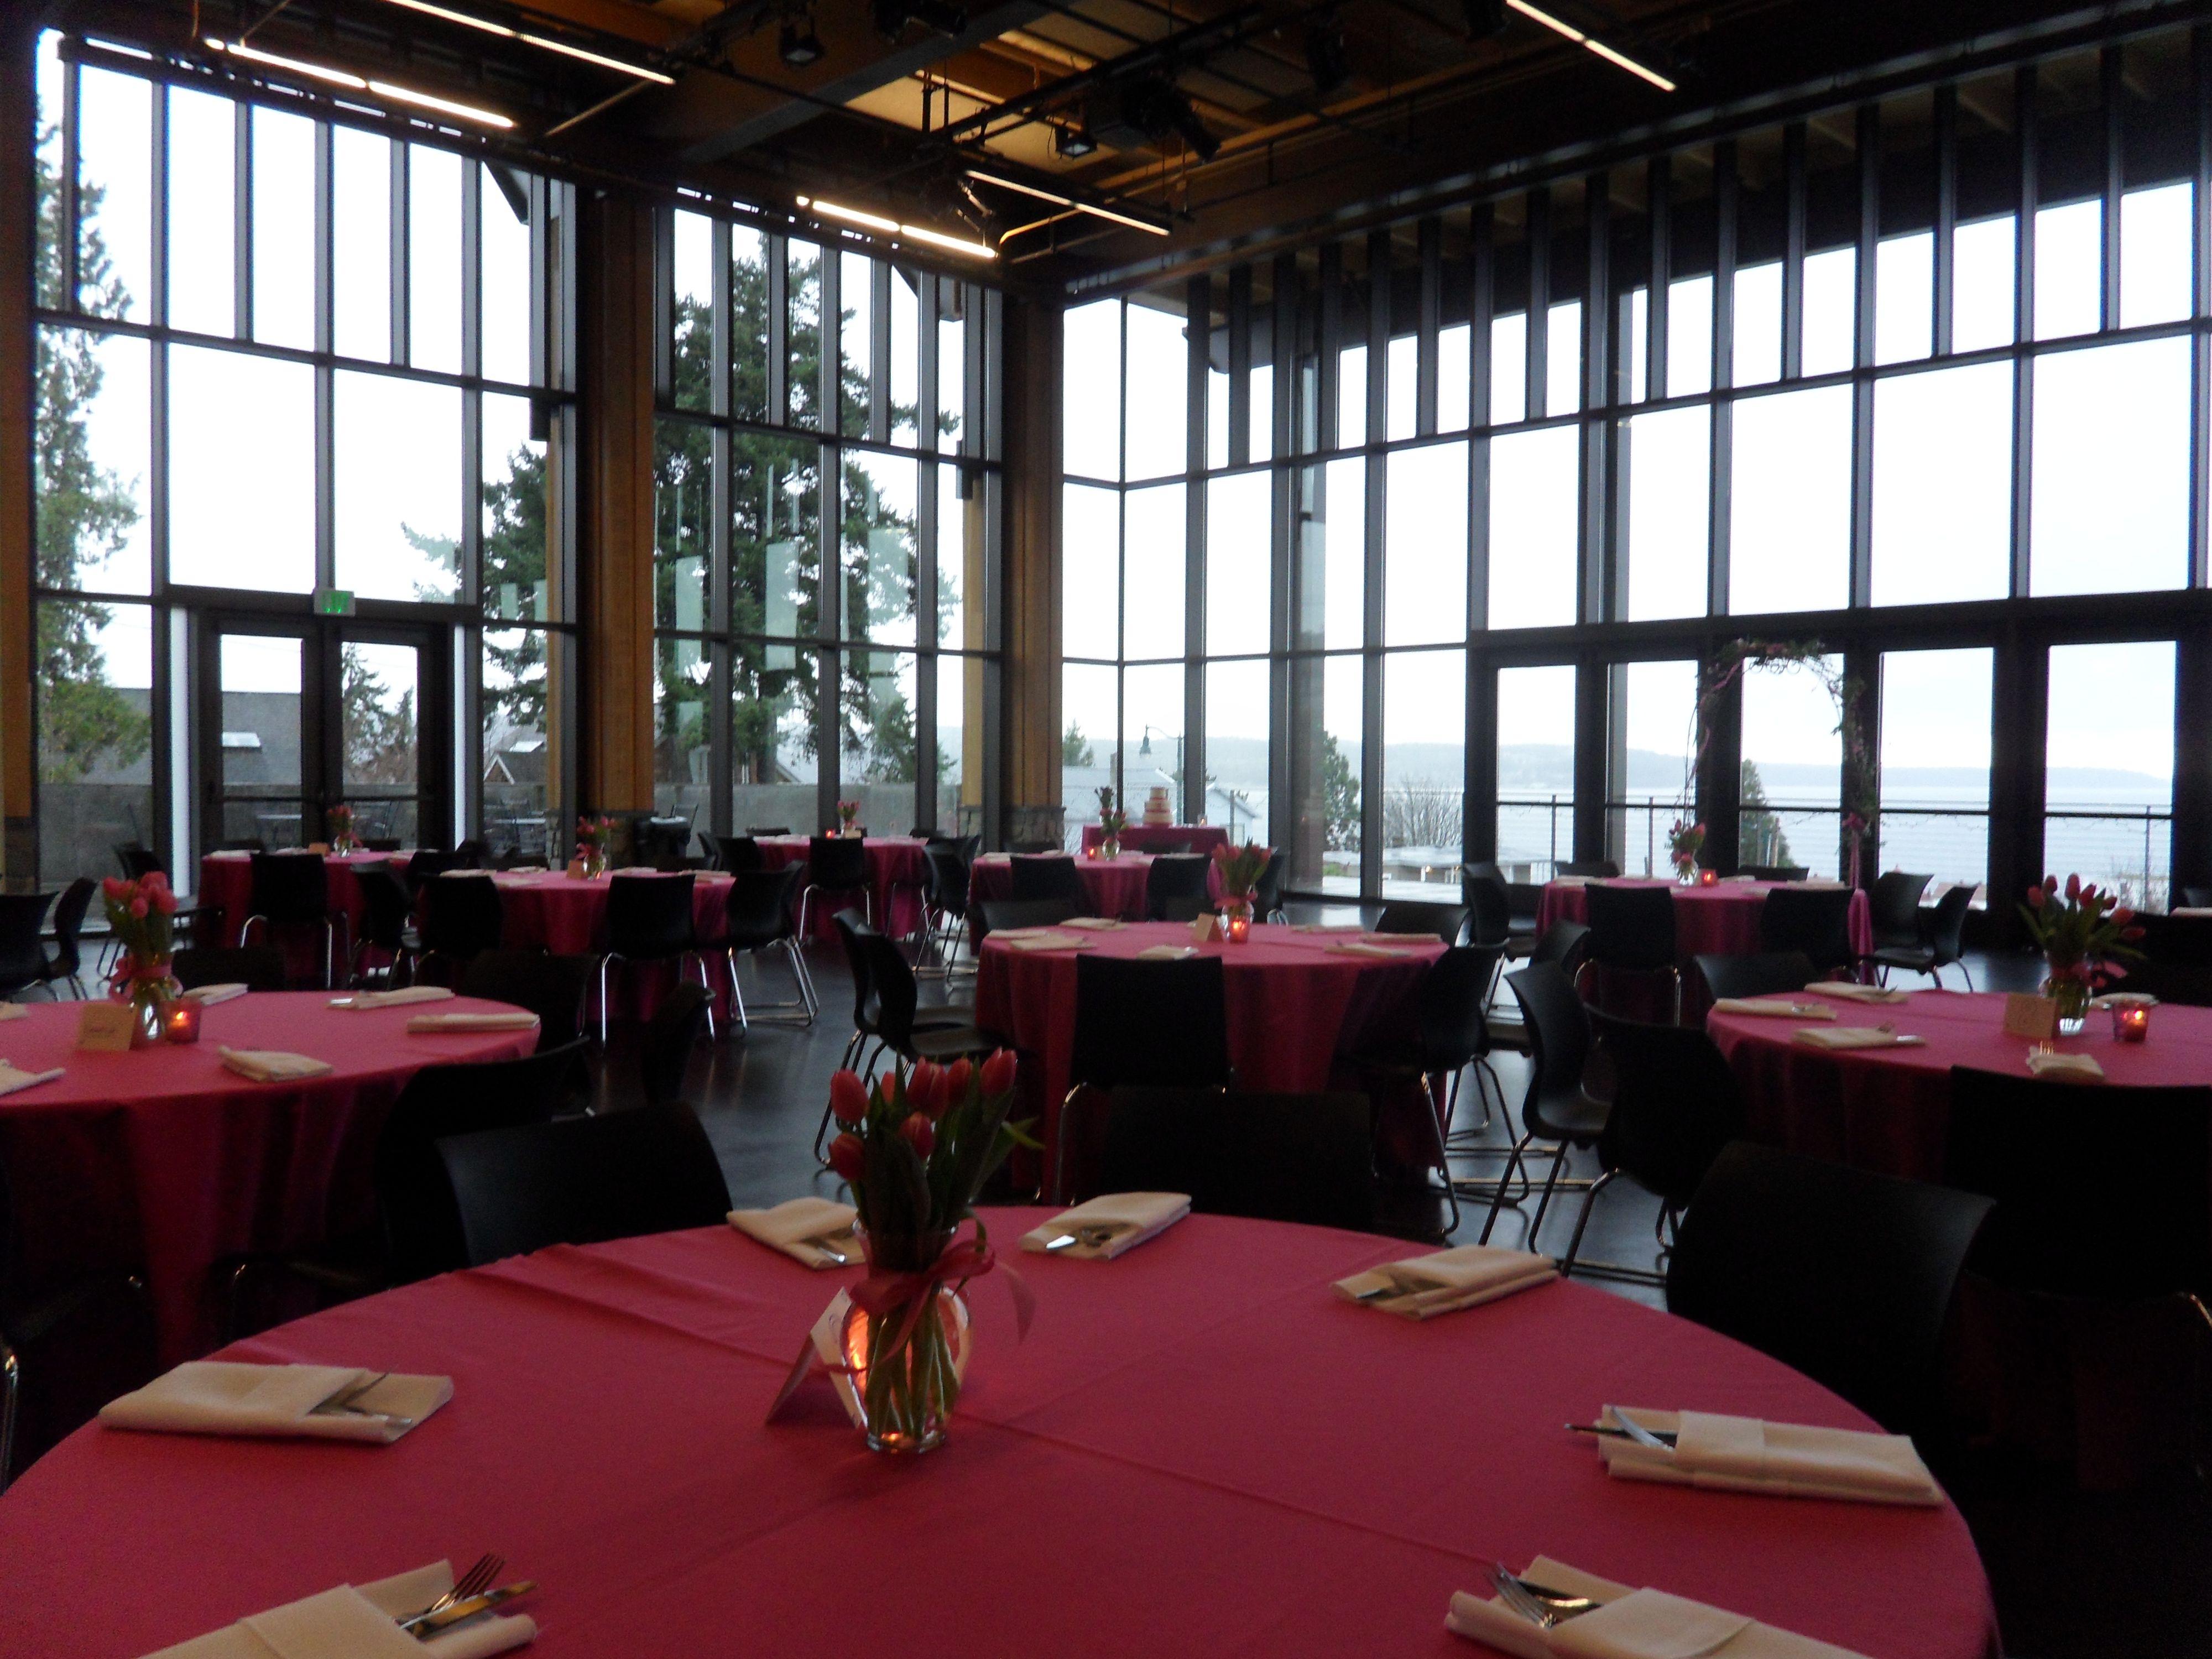 Rosehill Community Center Mukilteo Wa Romantic Lighting Tent Wedding Rose Wedding